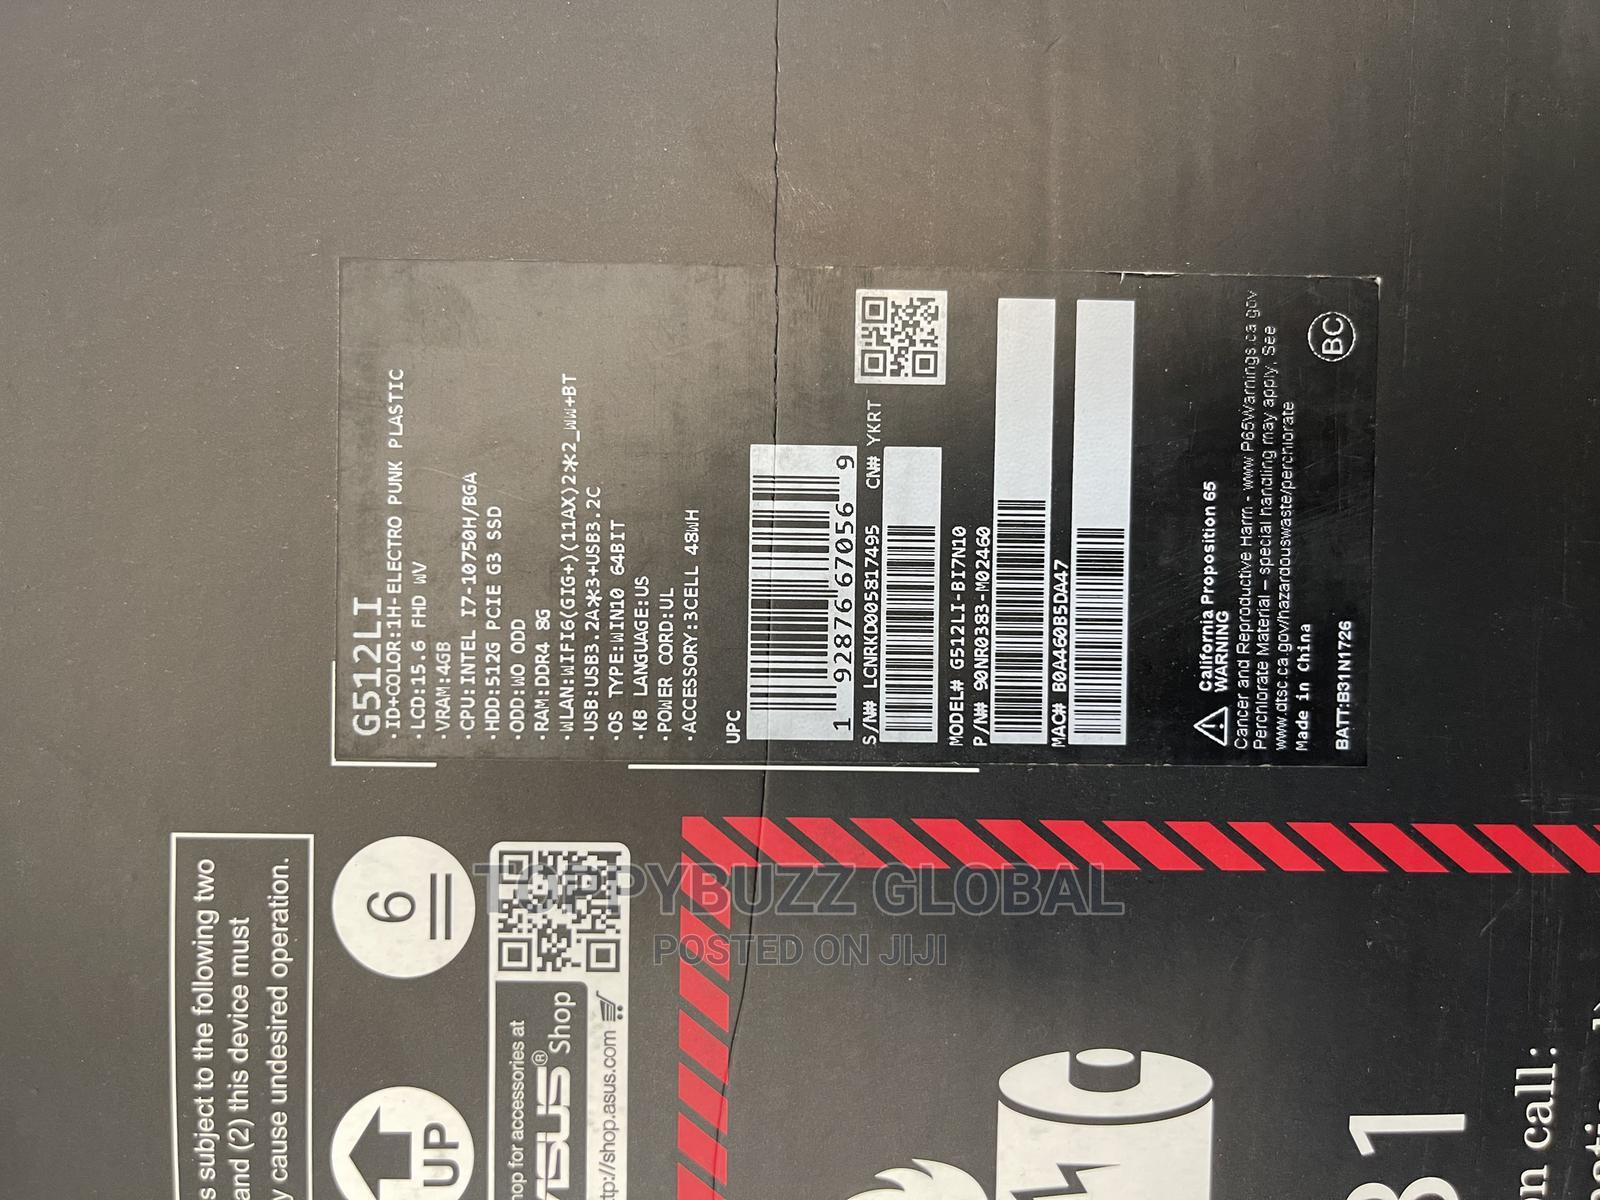 Archive: New Laptop Asus ROG Strix G15 G512 16GB Intel Core I7 SSD 512GB